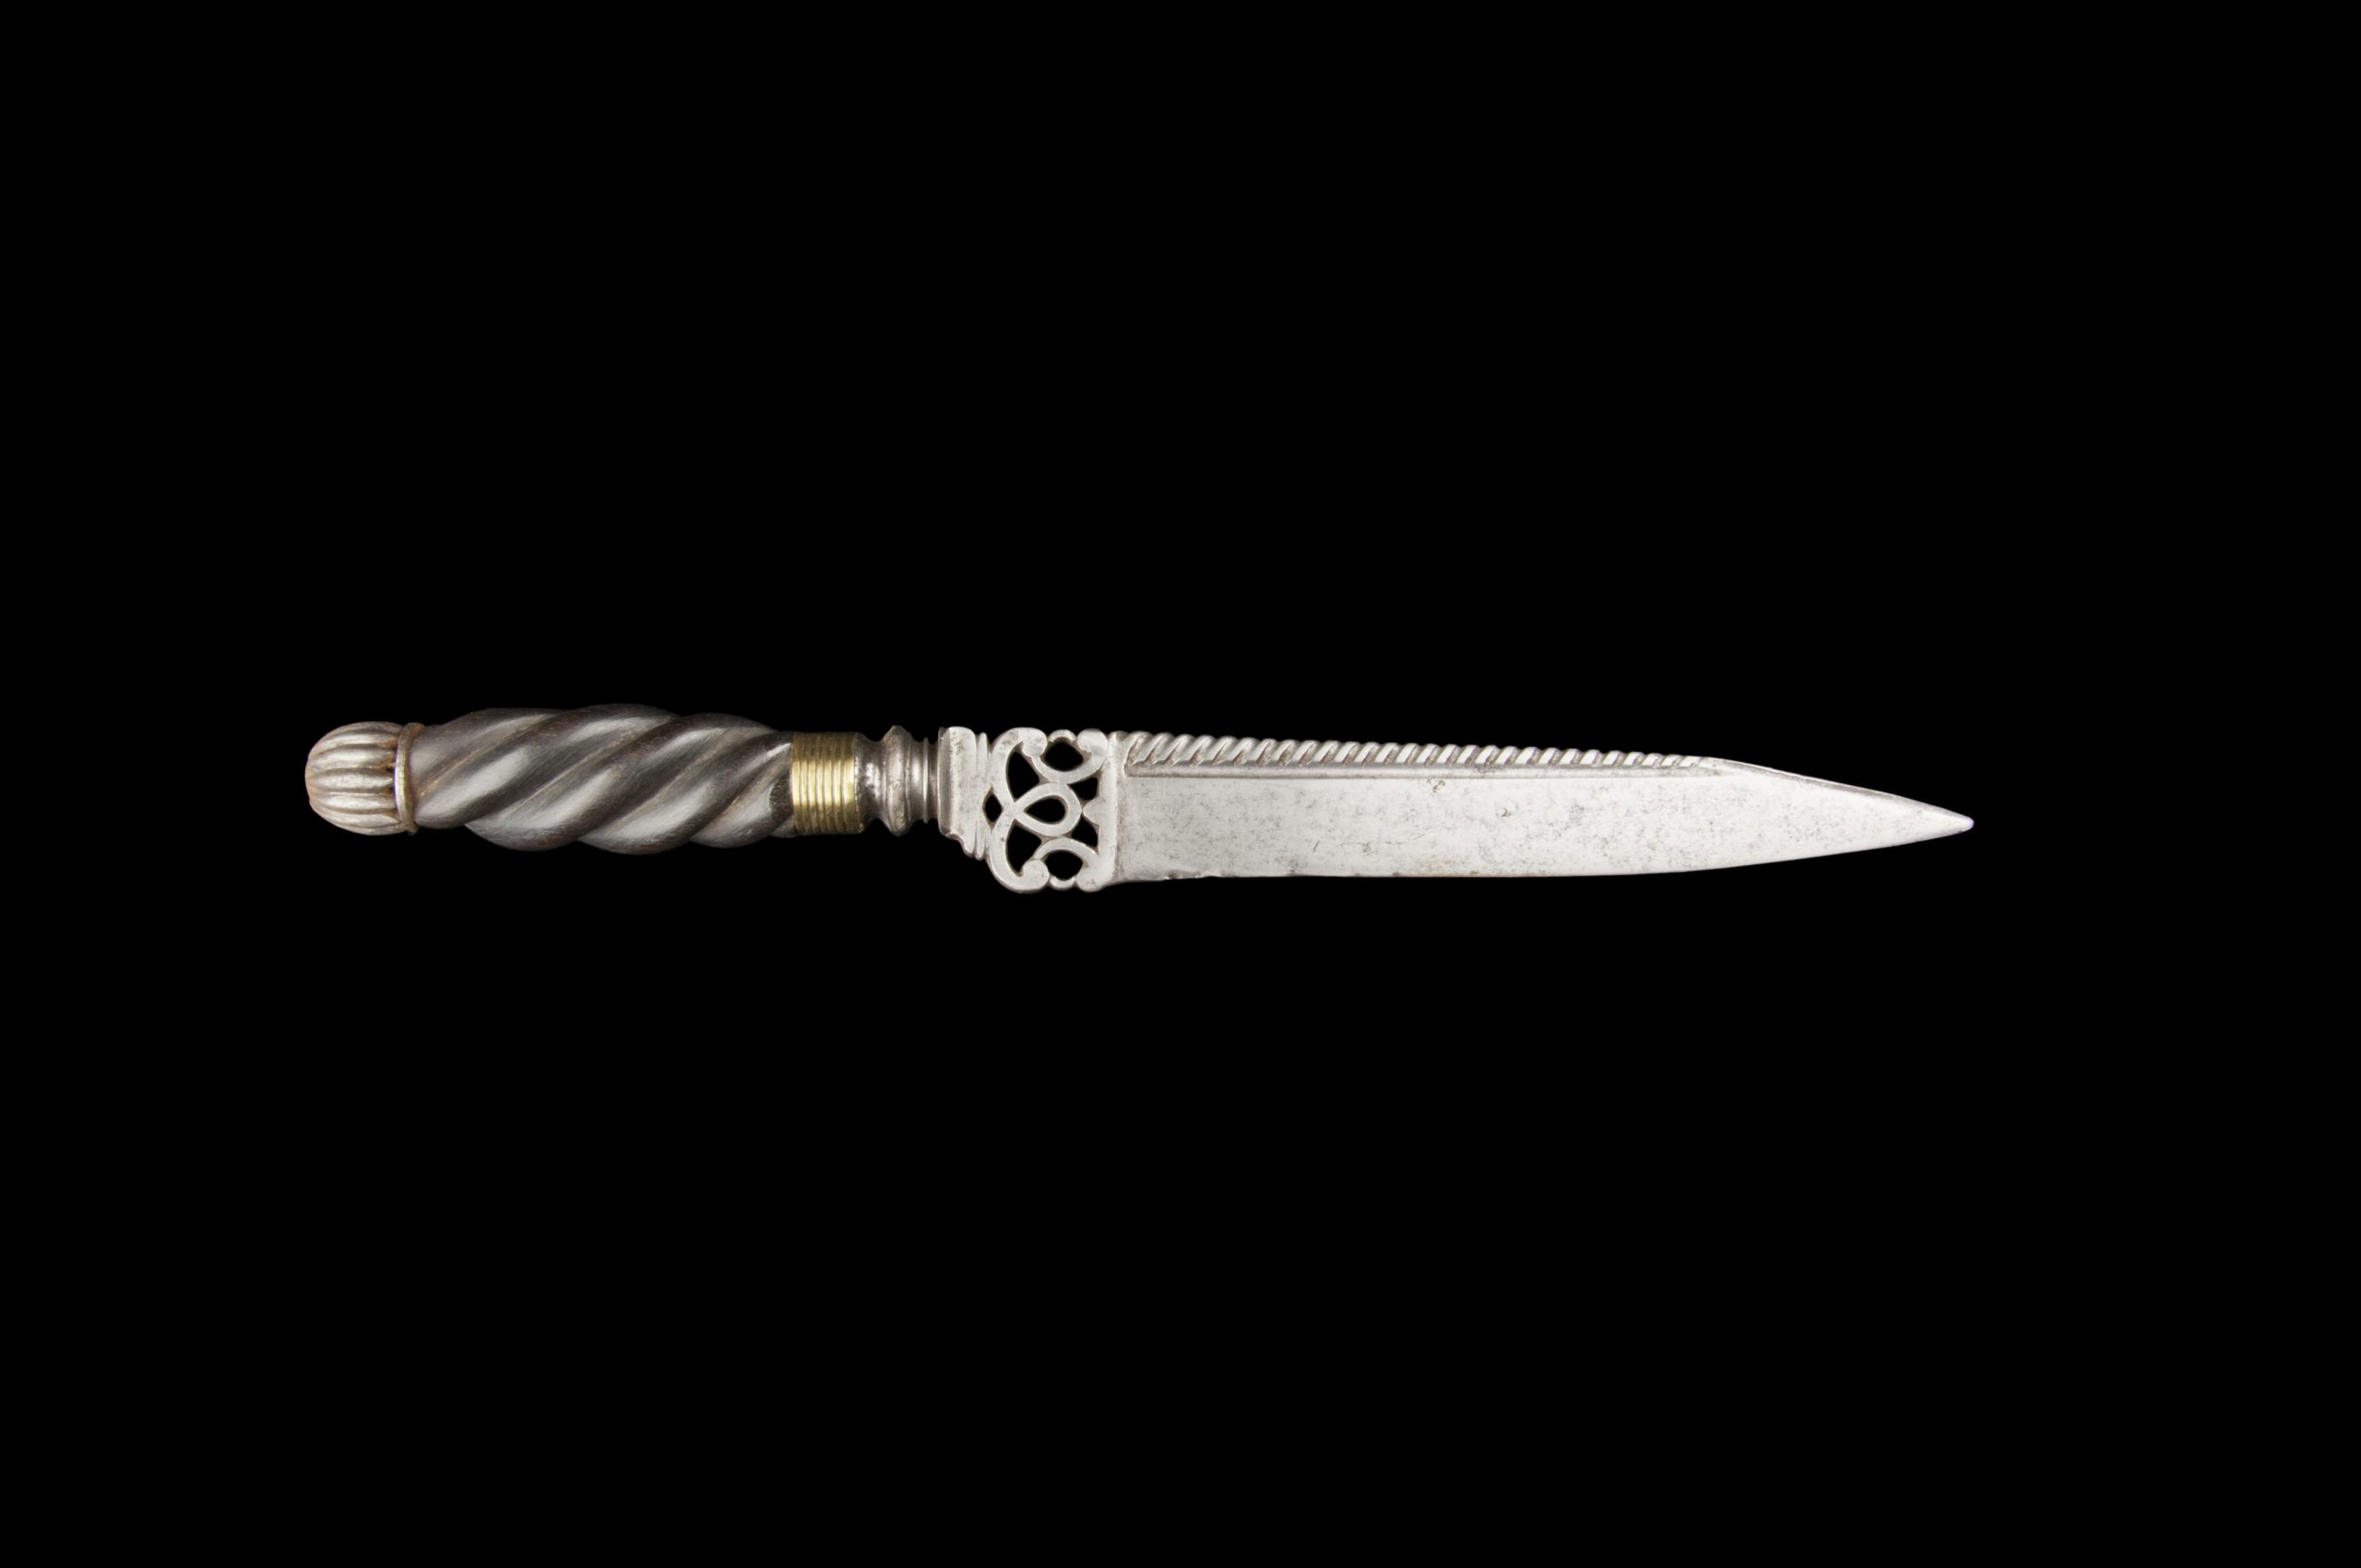 Objeto museológico (faca)